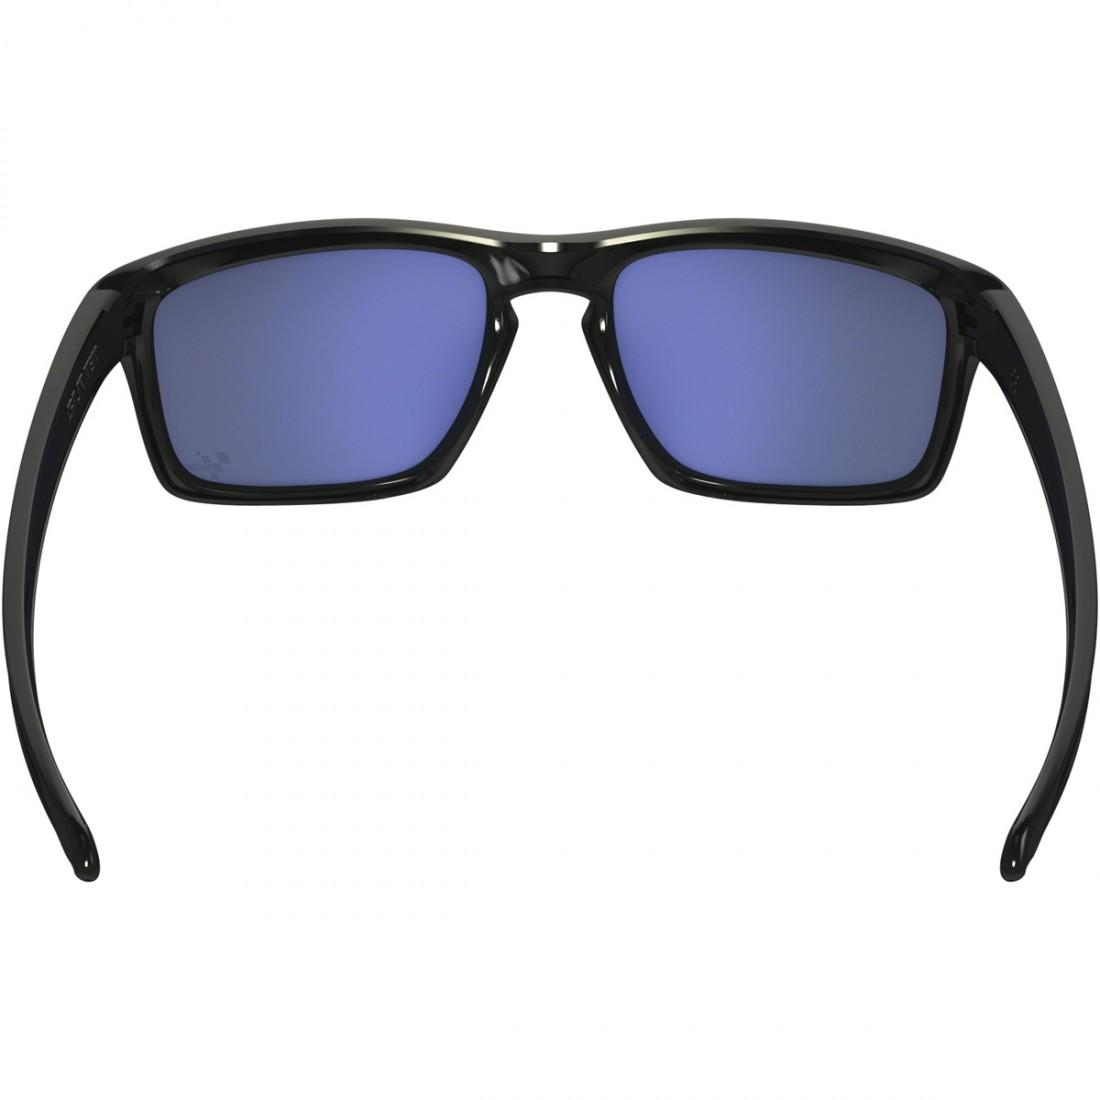 273affe1b8 OAKLEY Sliver Moto GP Polished Black   Ice Iriudium Sun glasses ...